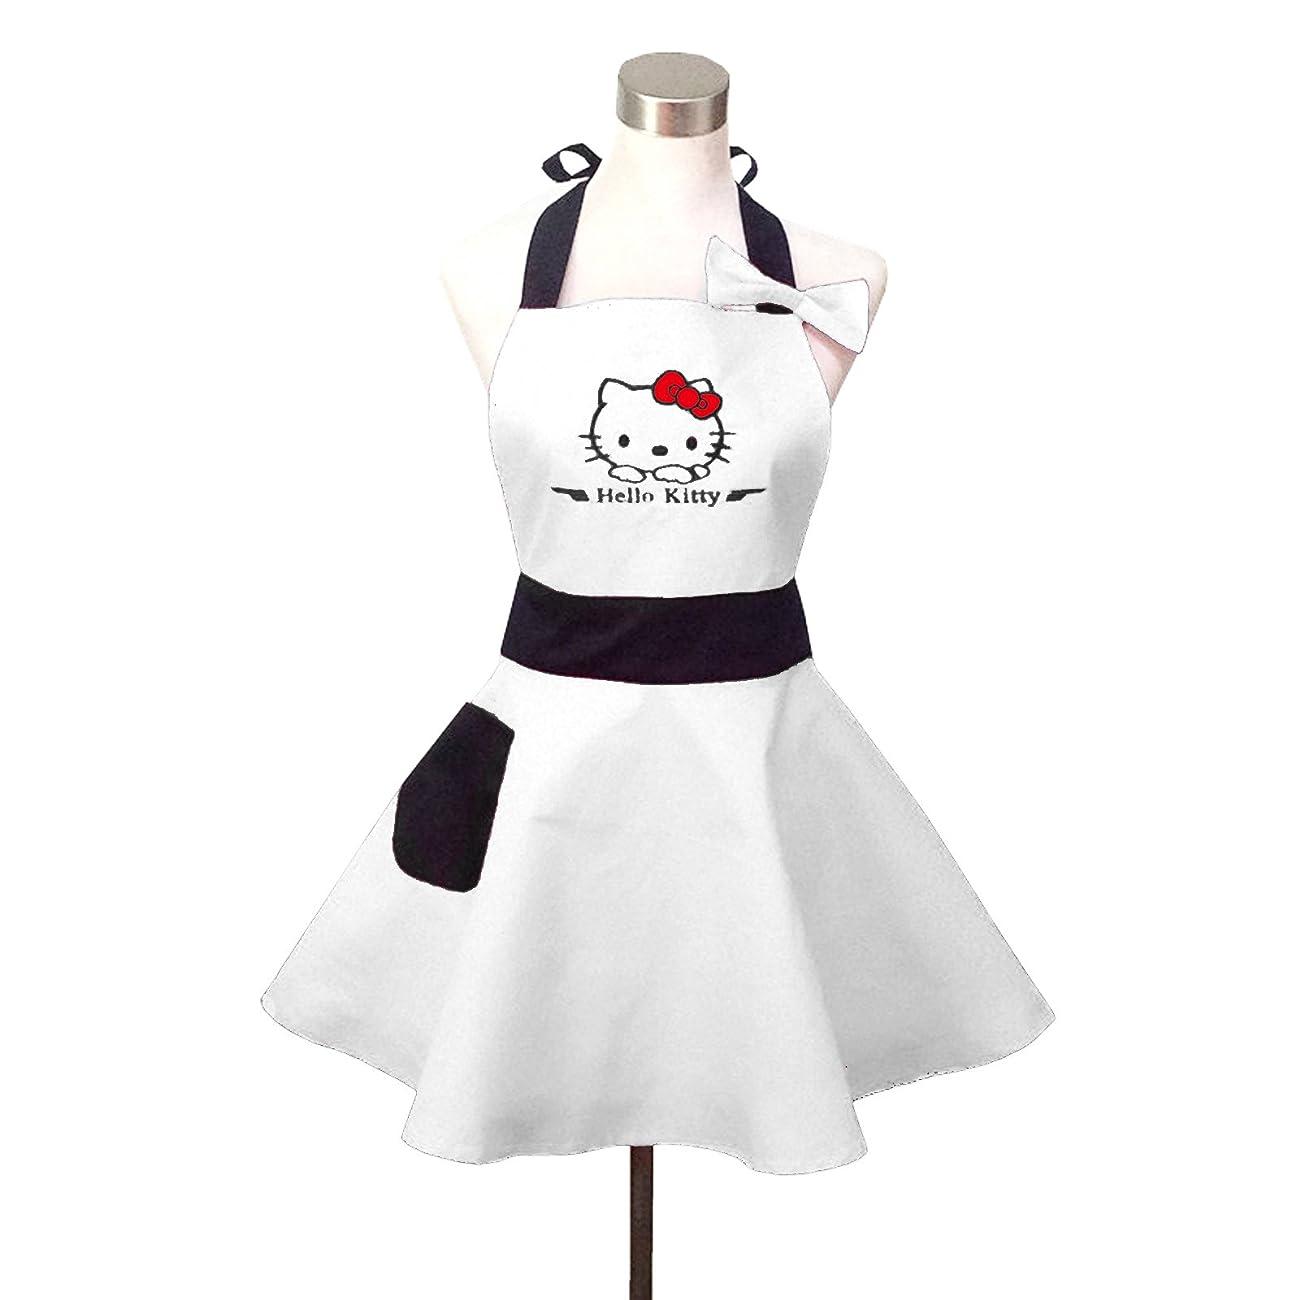 Lovely Hello Kitty White Retro Kitchen Aprons for Woman Girl Cotton Cooking Salon Pinafore Vintage Apron Dress 0